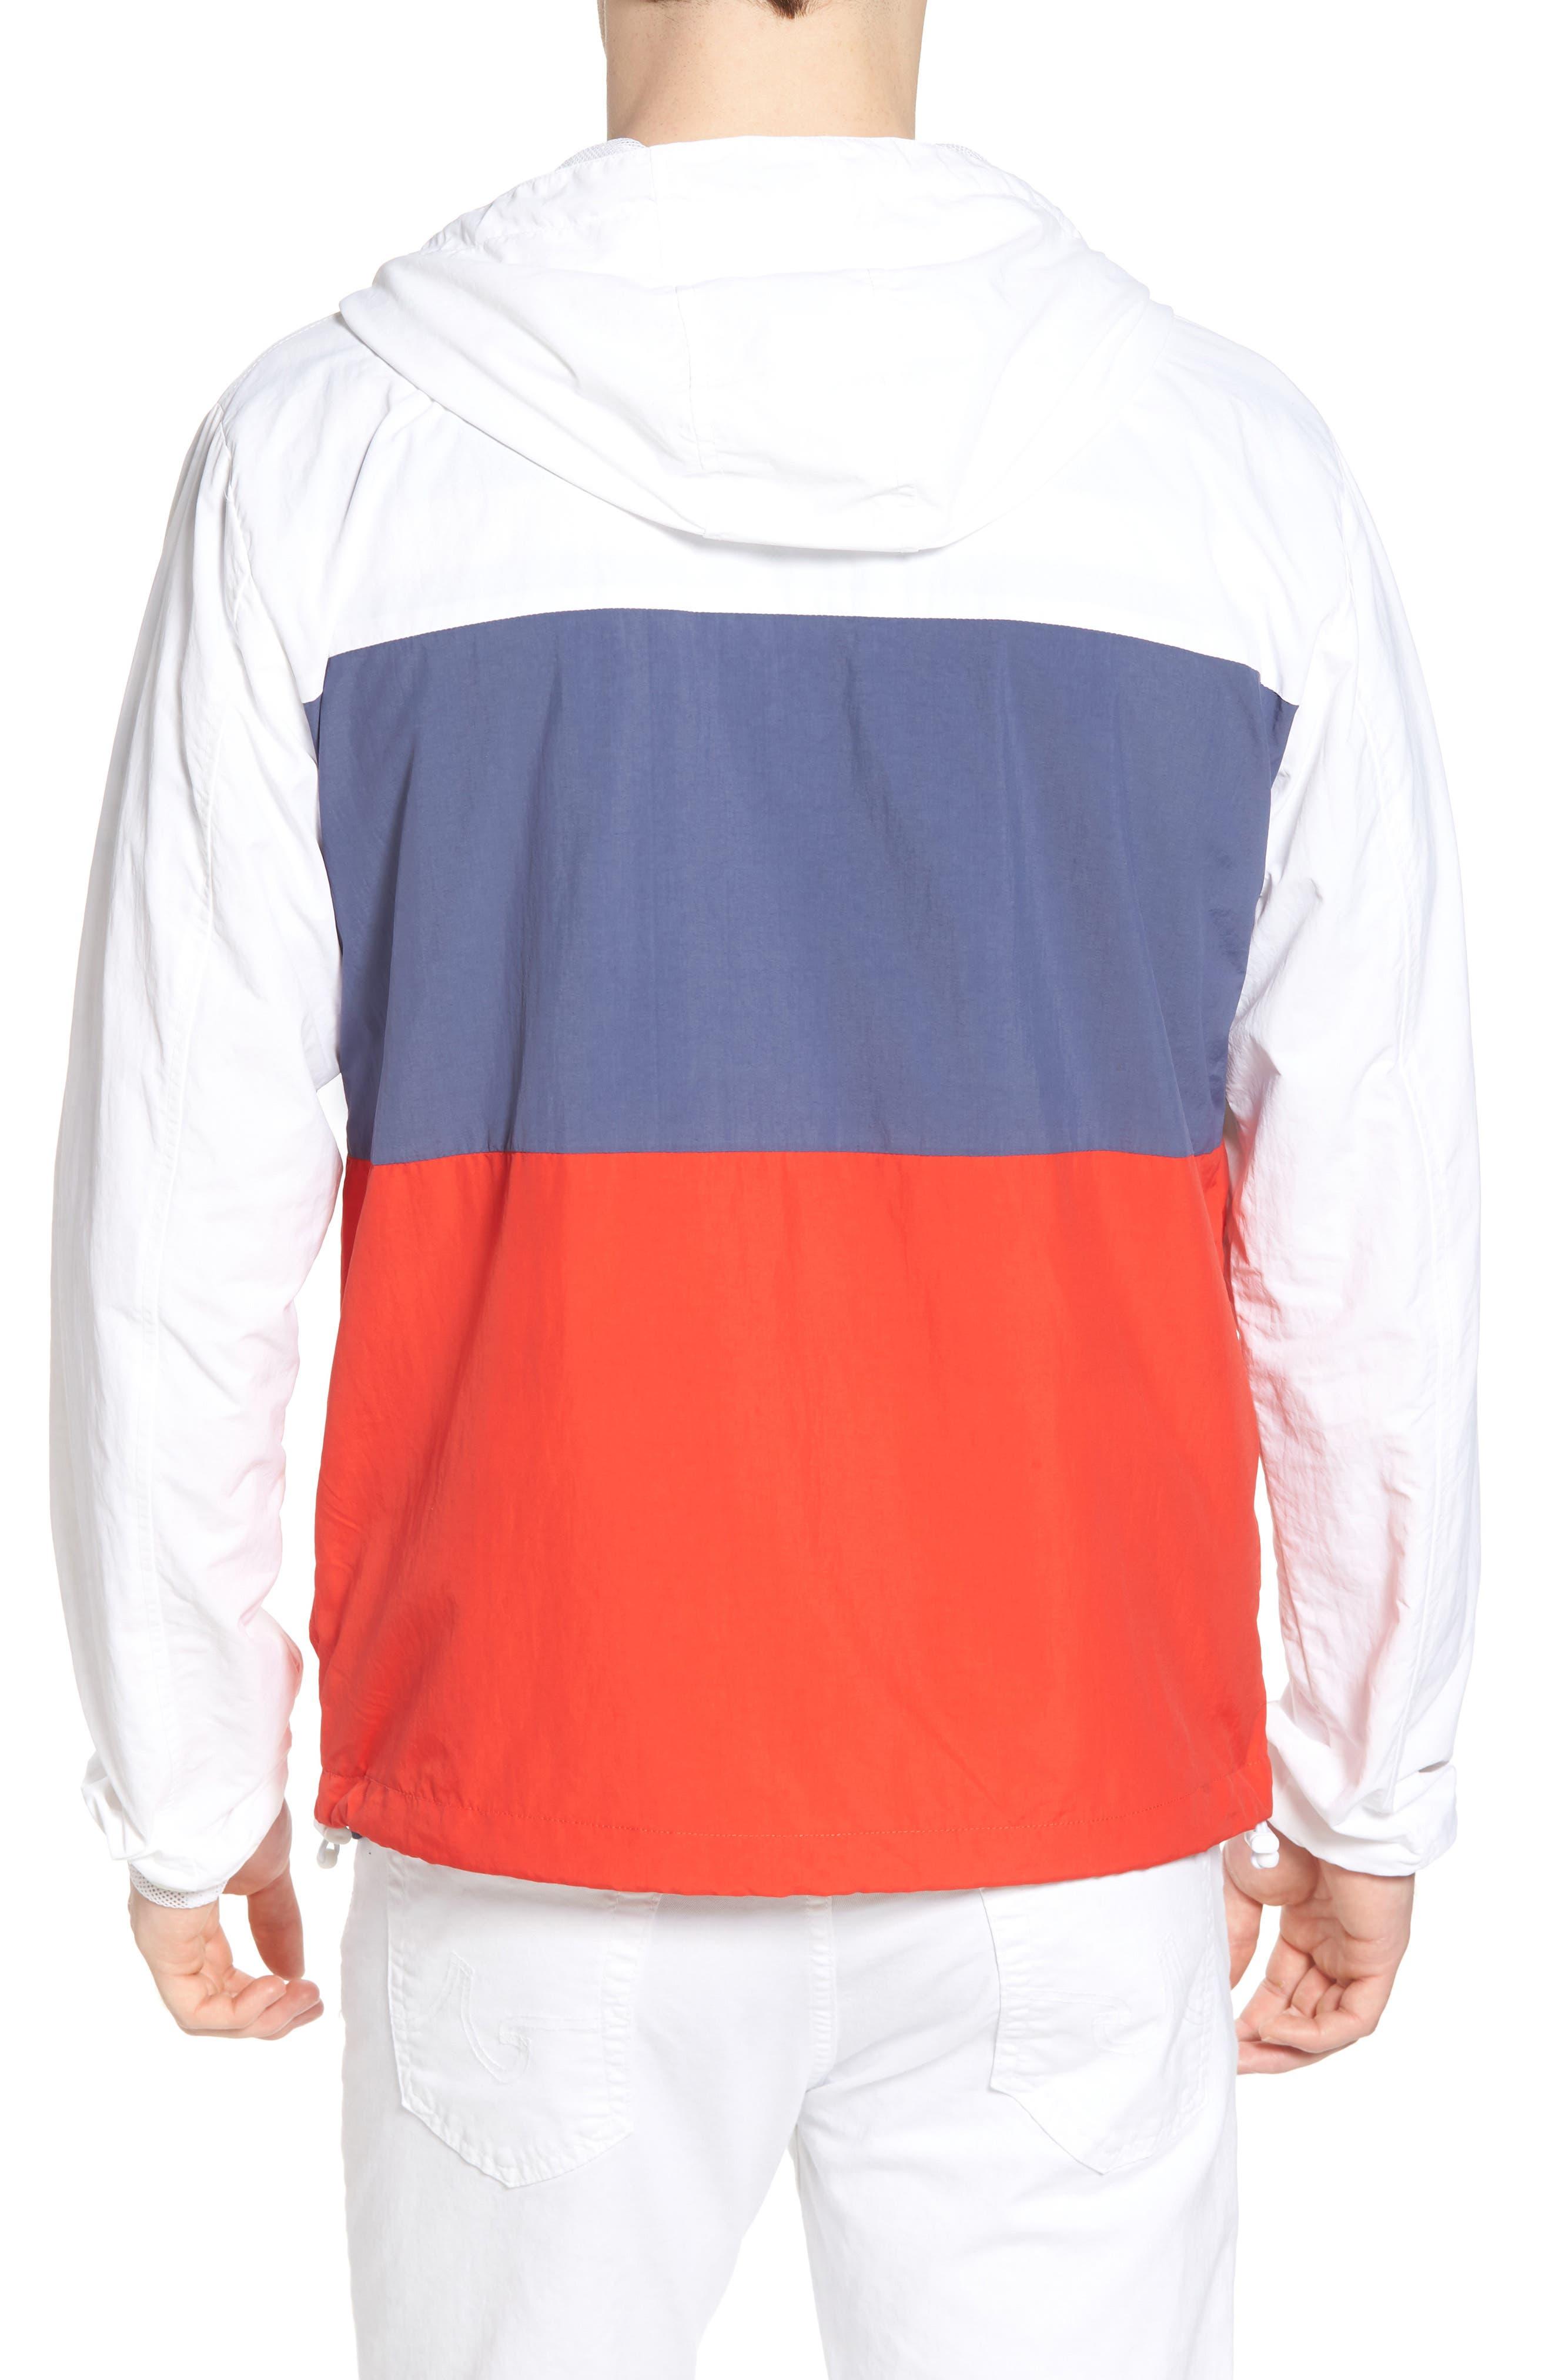 Alosa Colorblock Jacket,                             Alternate thumbnail 2, color,                             White